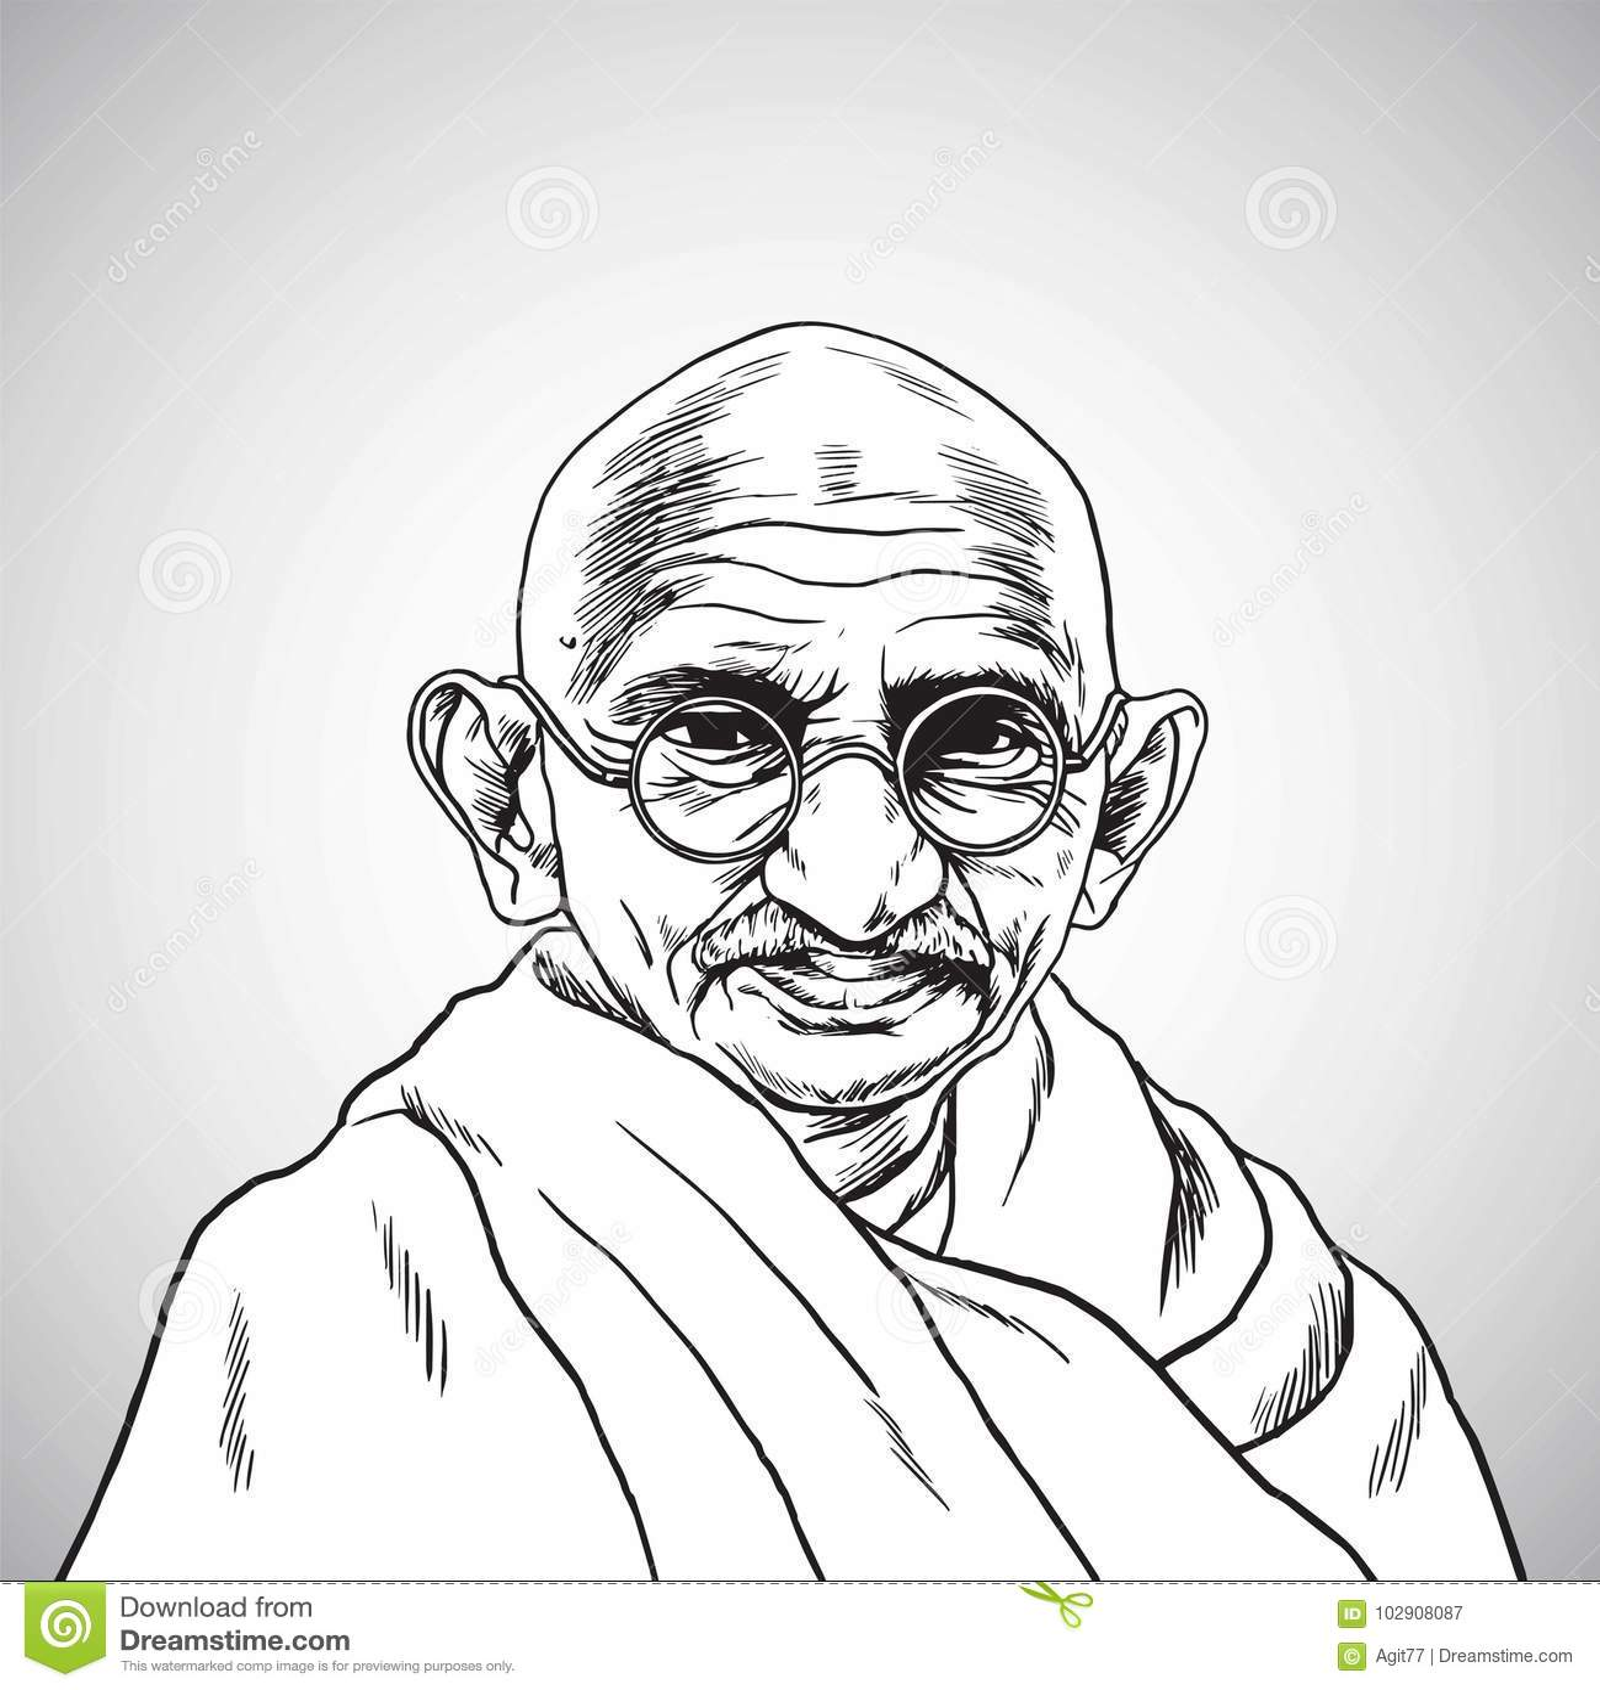 Mahatma gandhi vector portrait drawing illustration october 31 2017